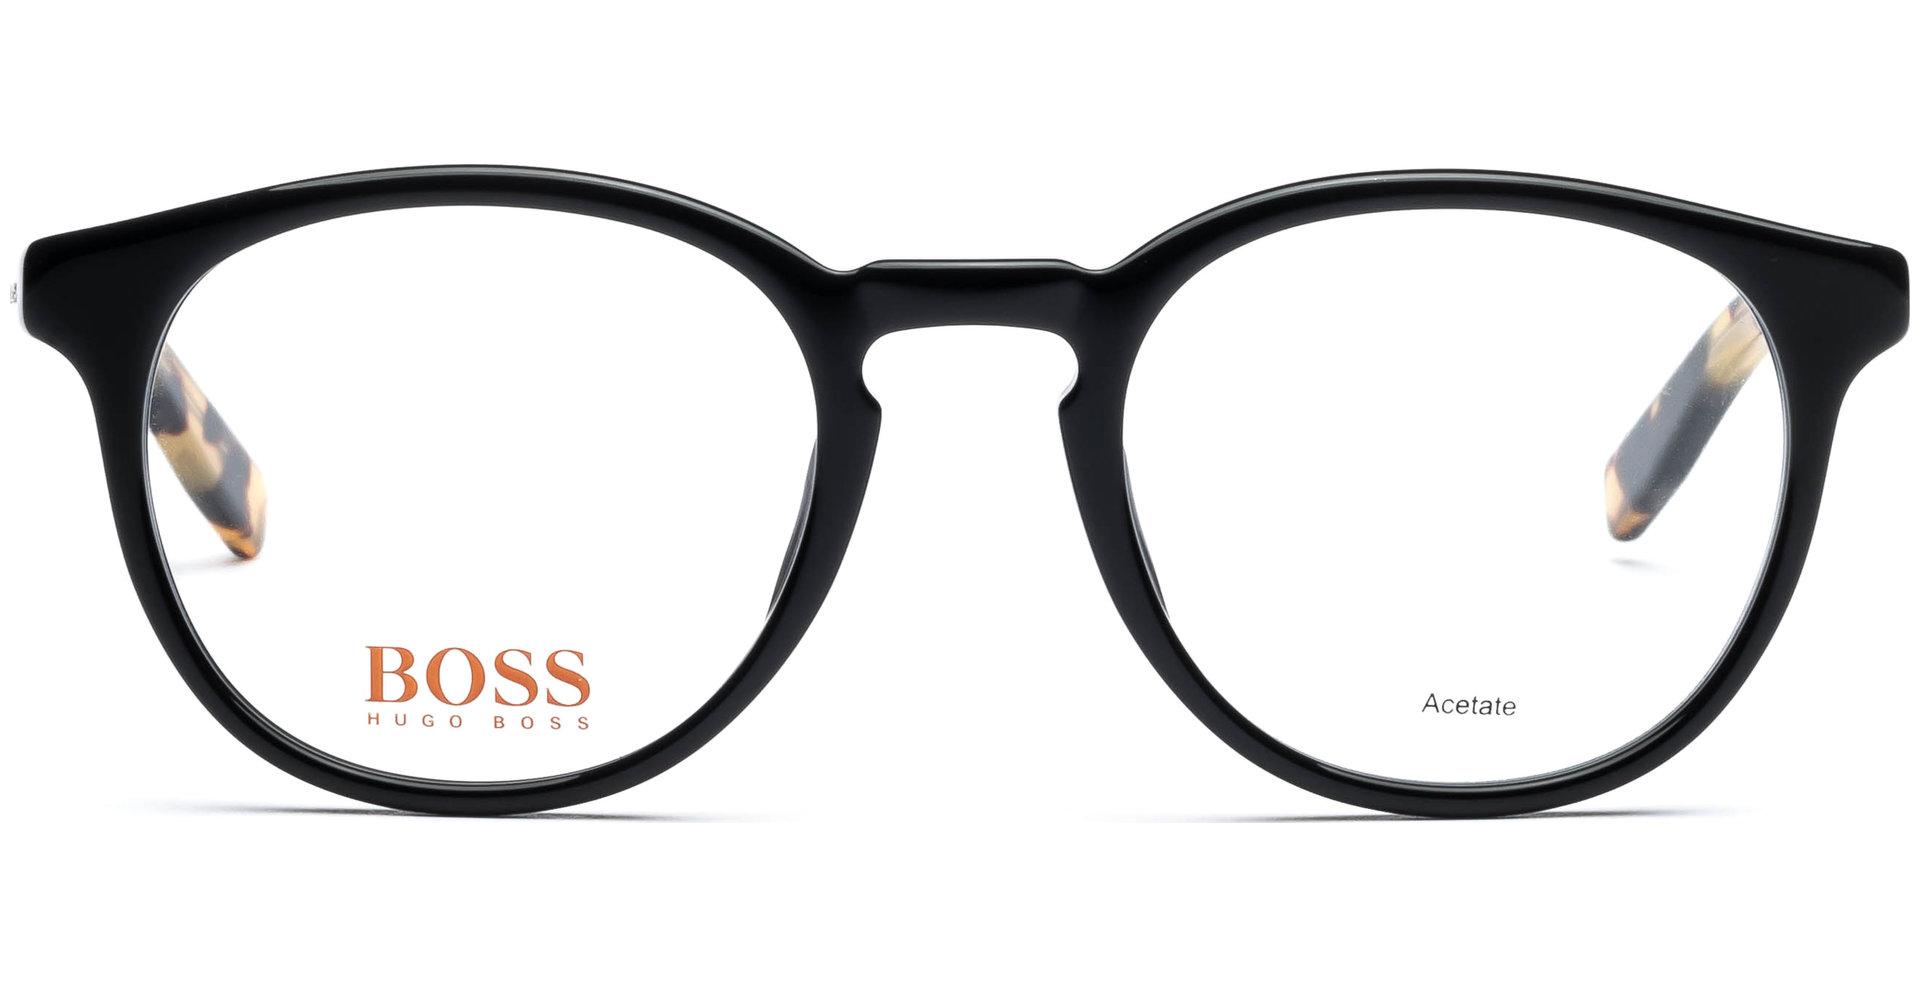 boss boss orange bo0201 yq5 4921 mtrd dkrdbei von. Black Bedroom Furniture Sets. Home Design Ideas